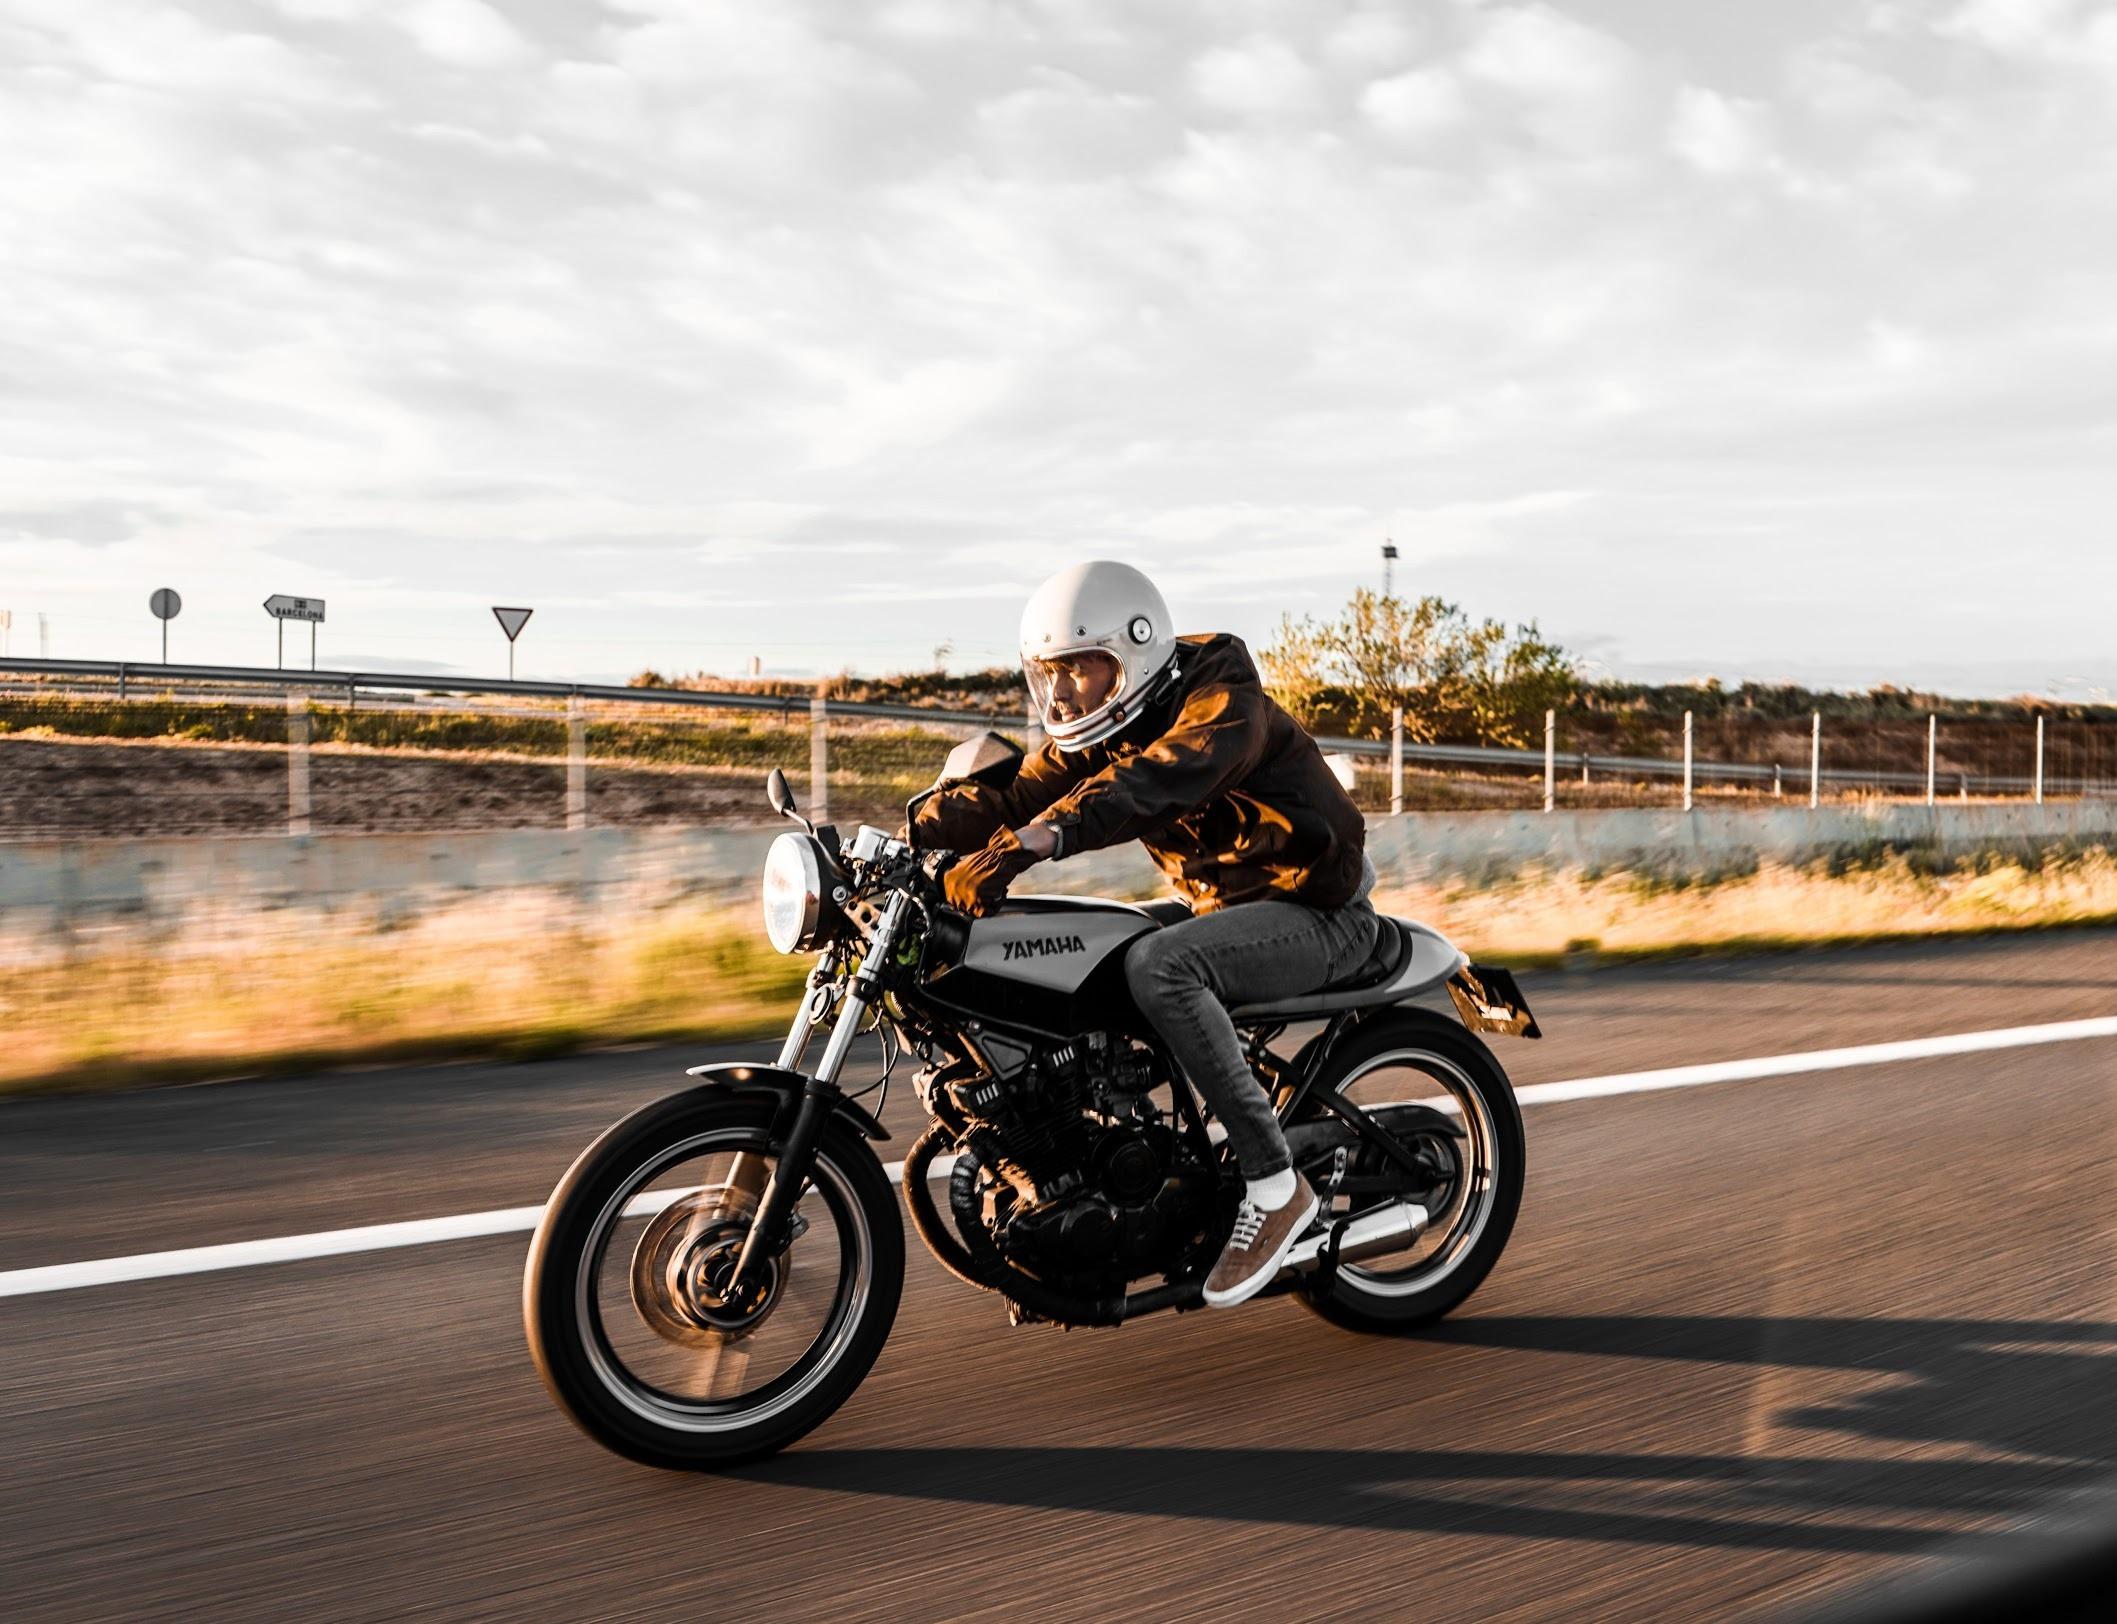 Yamaha XS400 - Location: BARCELONA